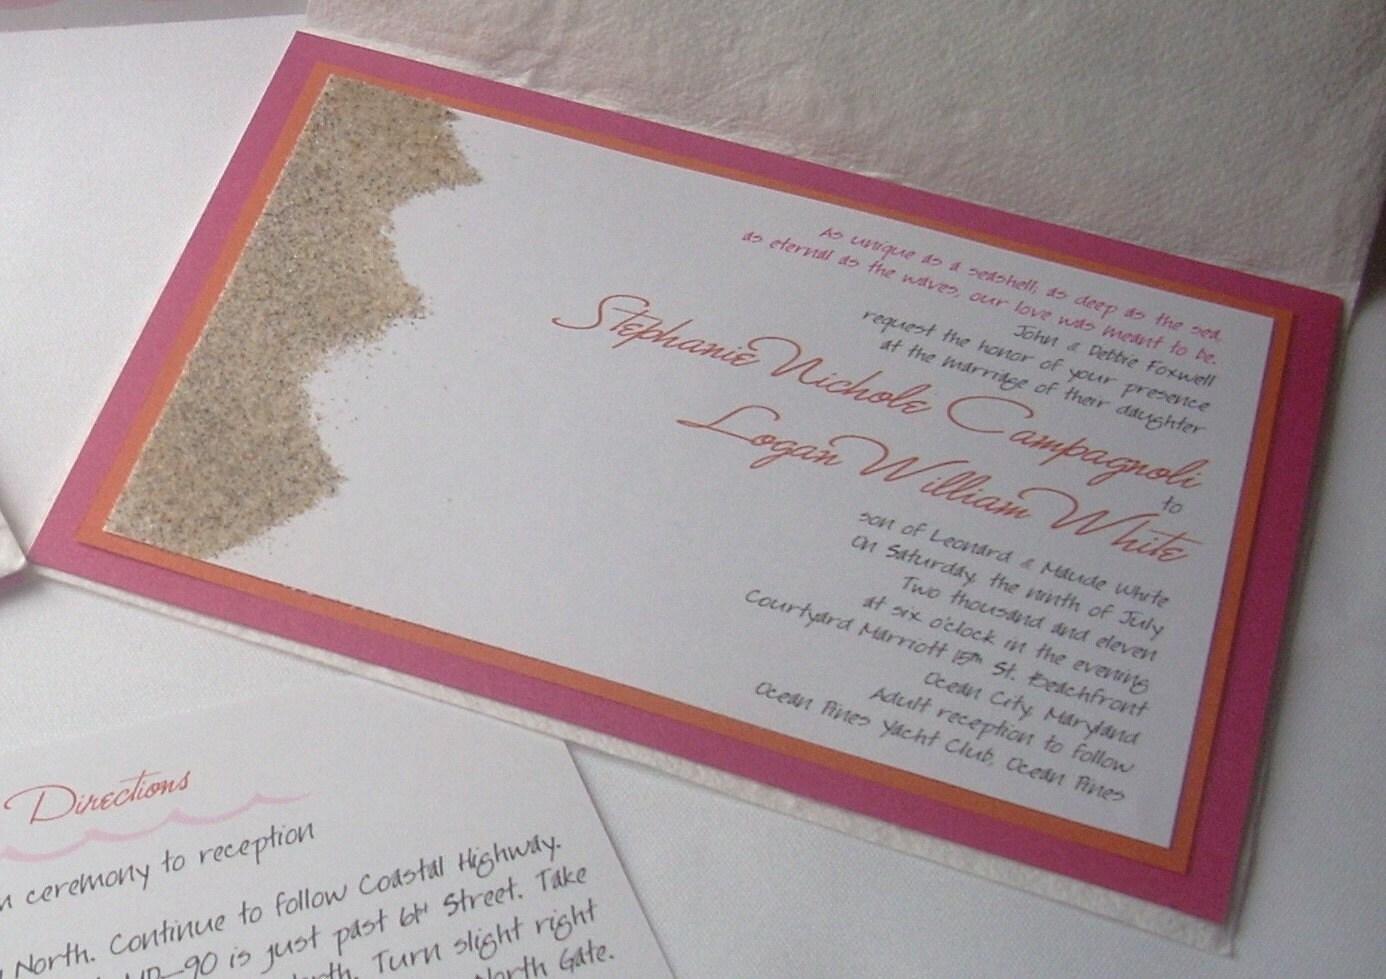 FIRST SAND INVITATION on Etsy - Pink & Orange Beach Sand Wedding Invitation Set of 100